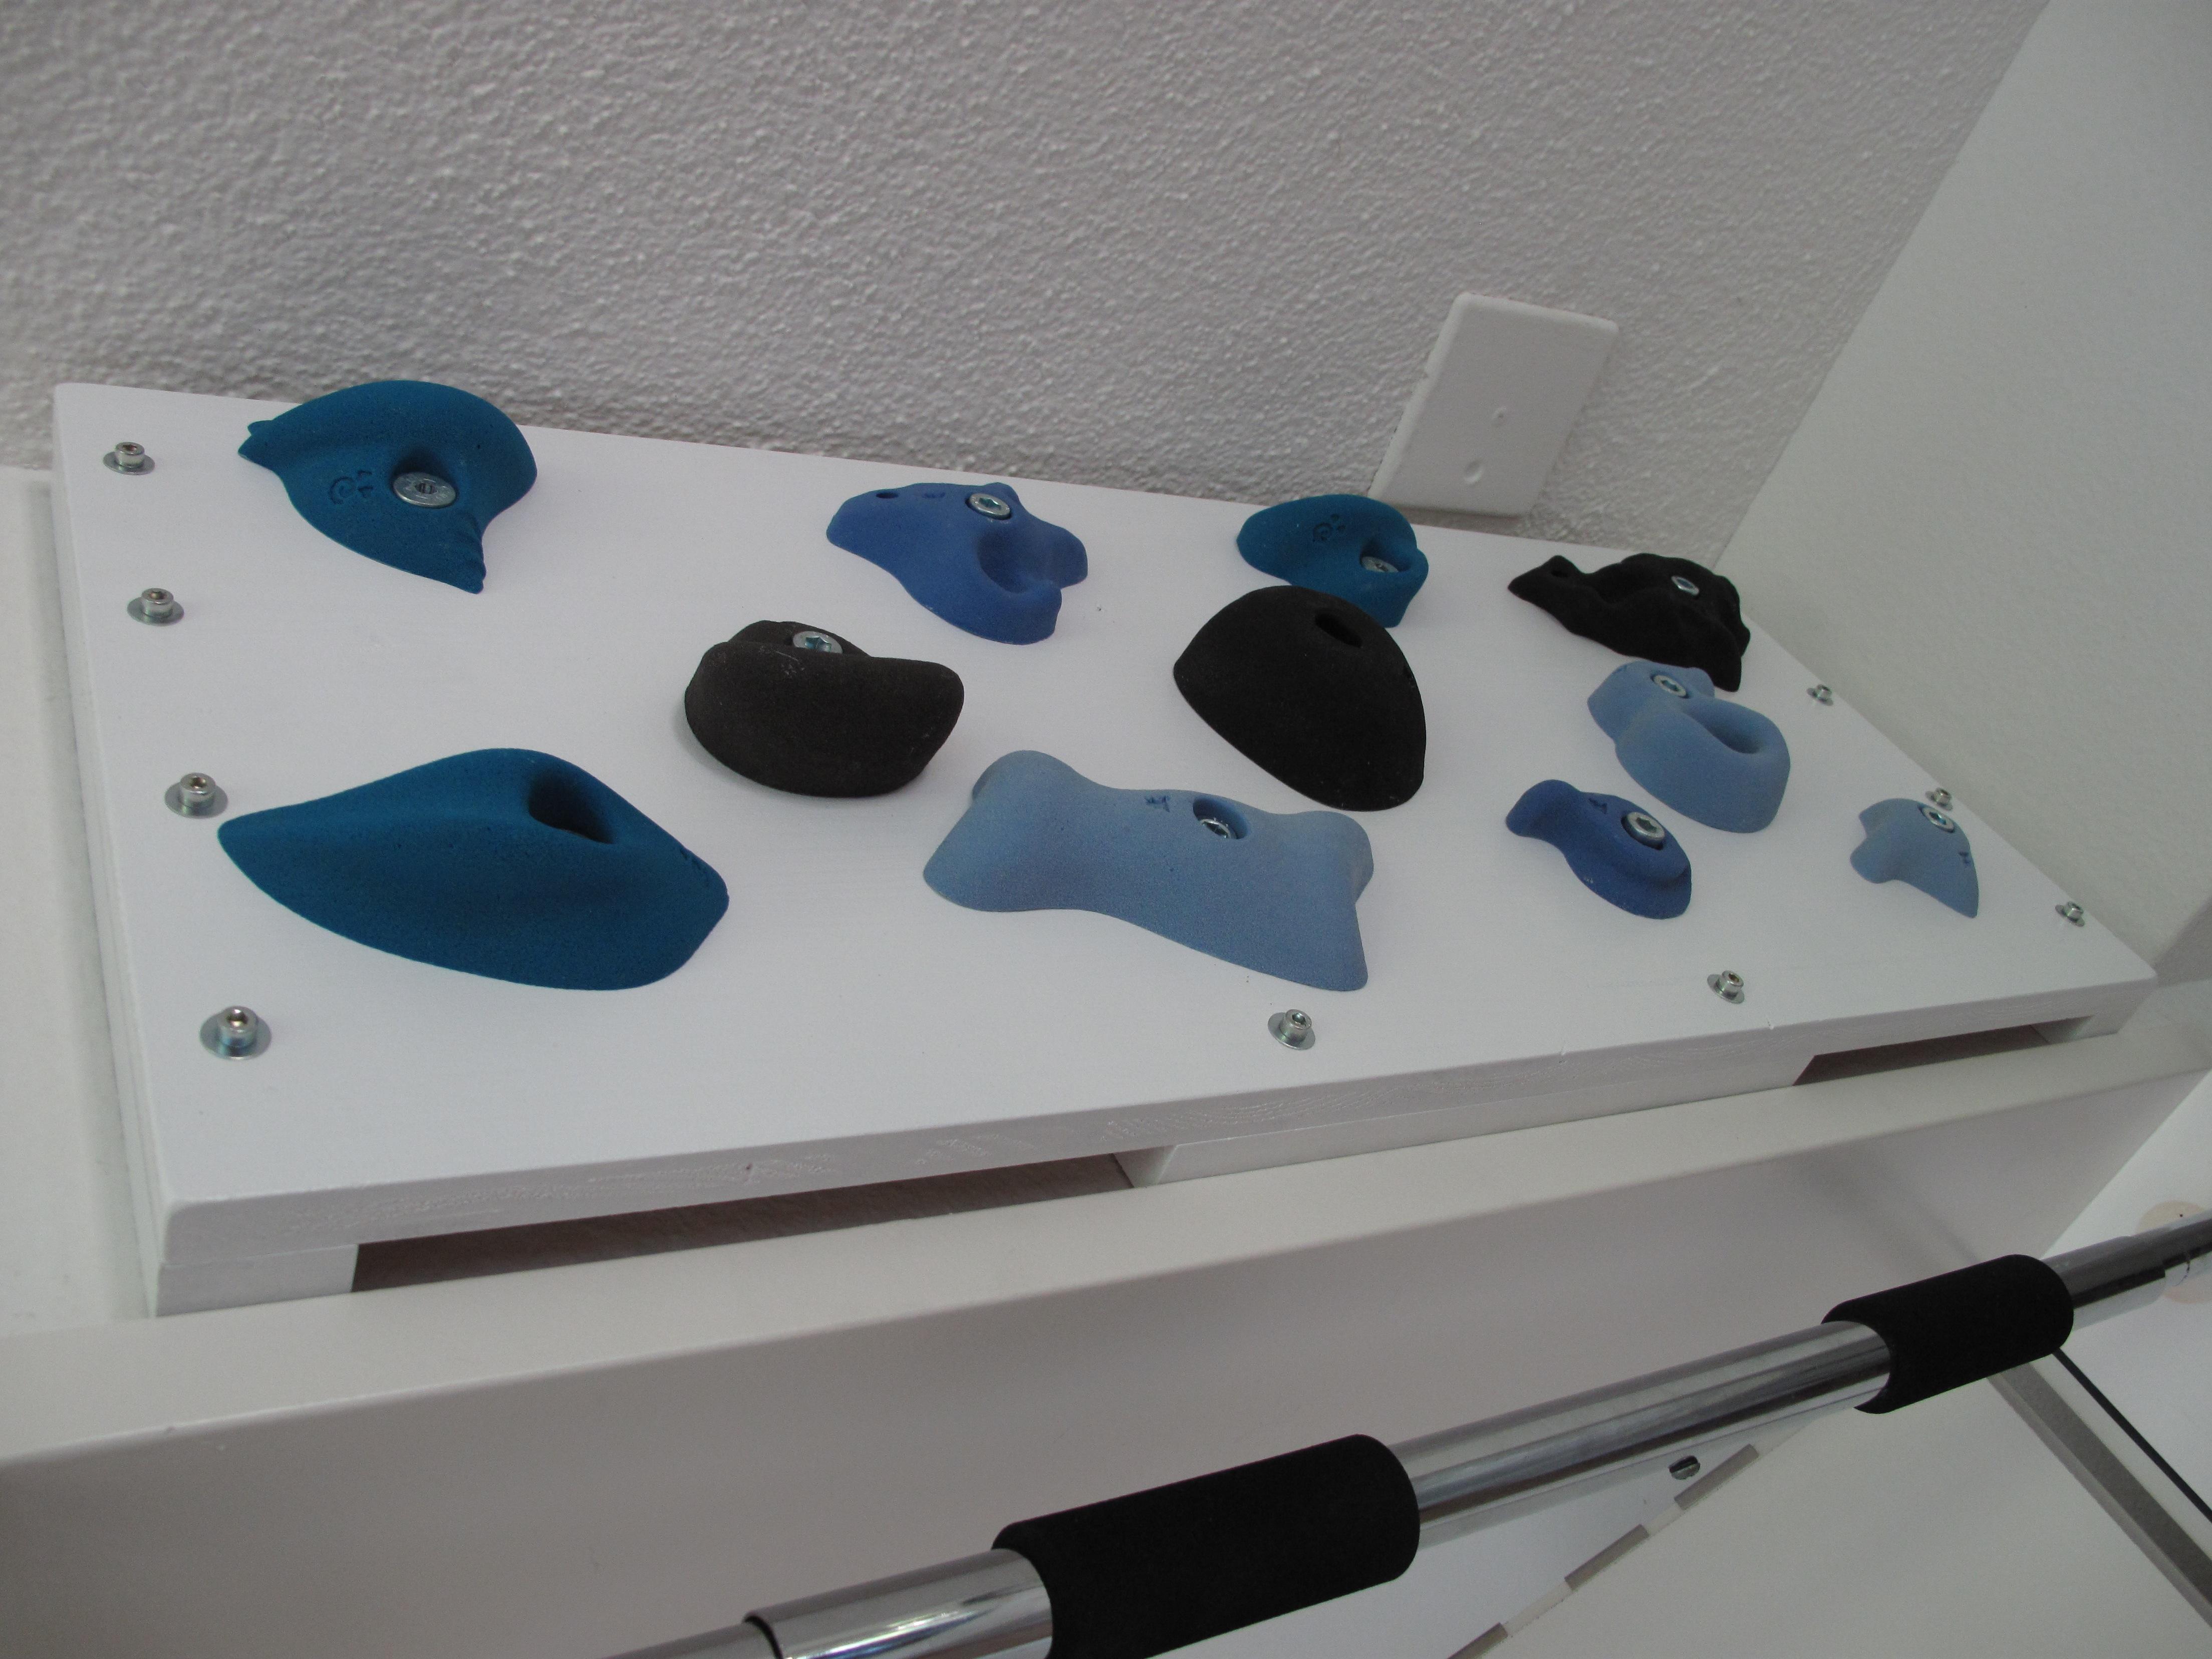 Training board for bouldering/climbing - The HangBoard